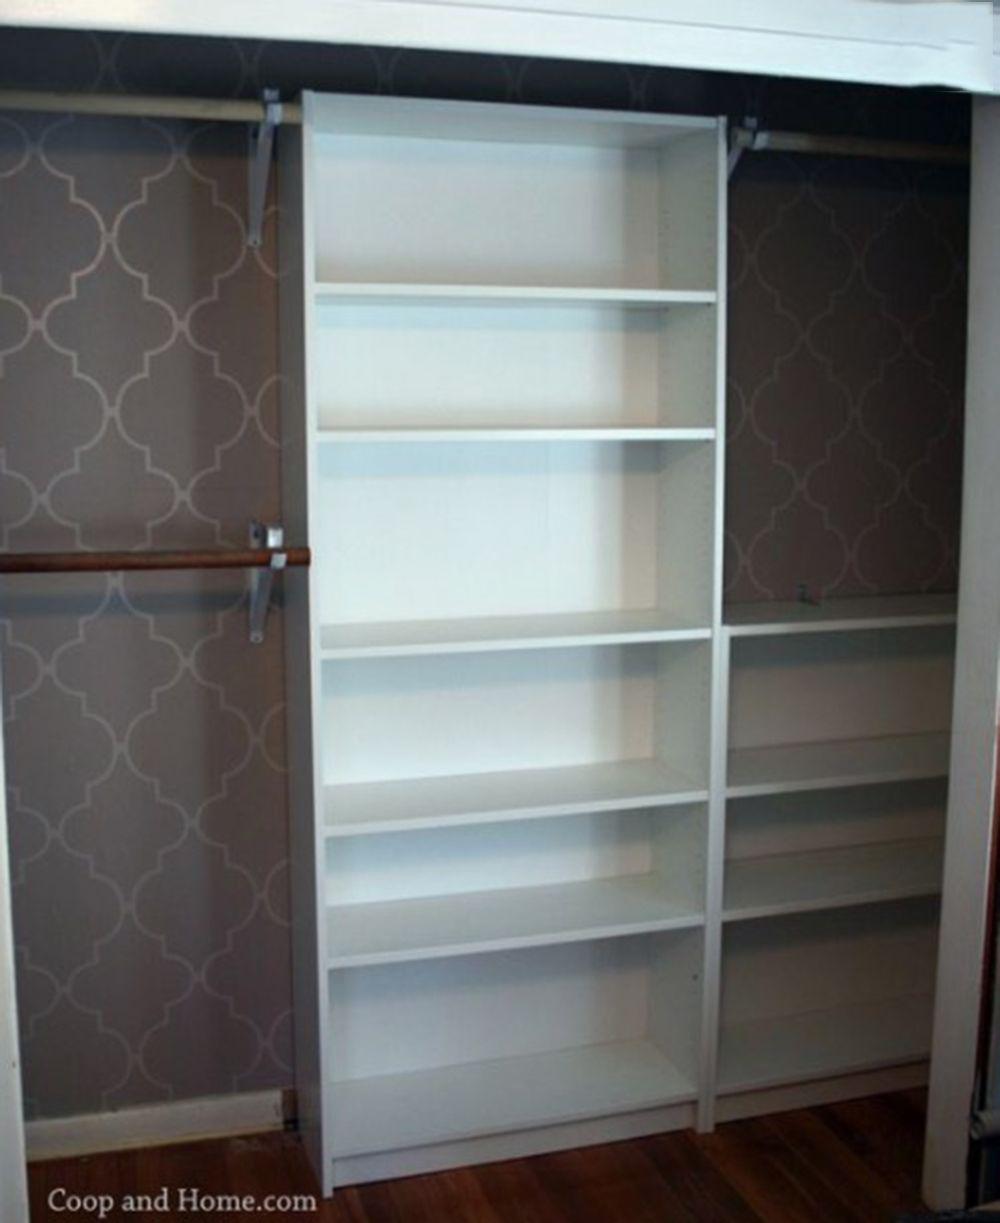 12 genius hacks to transform your IKEA BILLY bookcase | Ikea billy ...